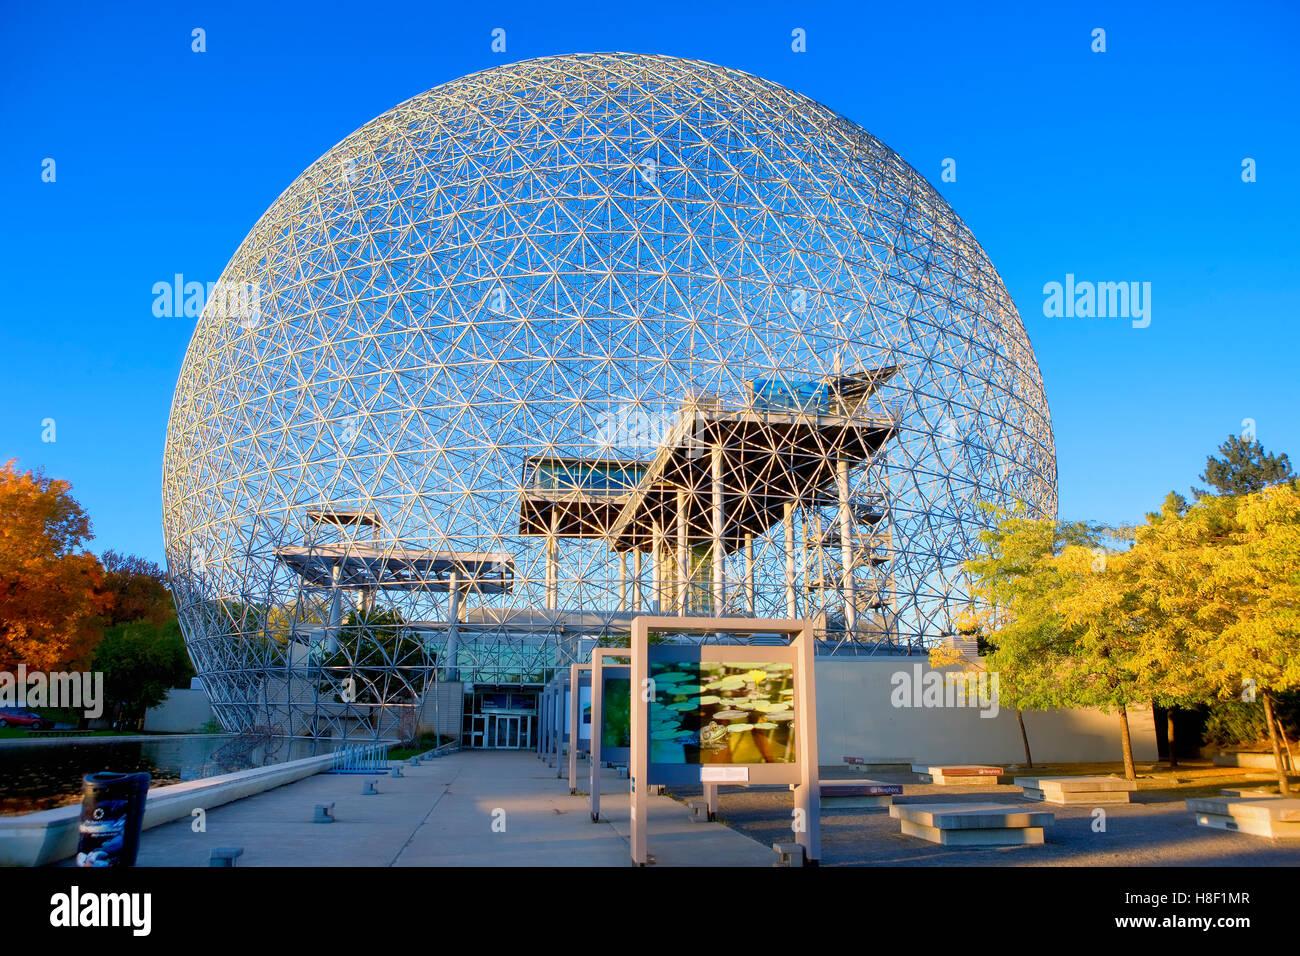 Die Biosphäre, Parc Jean Drapeau, Montreal, Kanada Stockbild